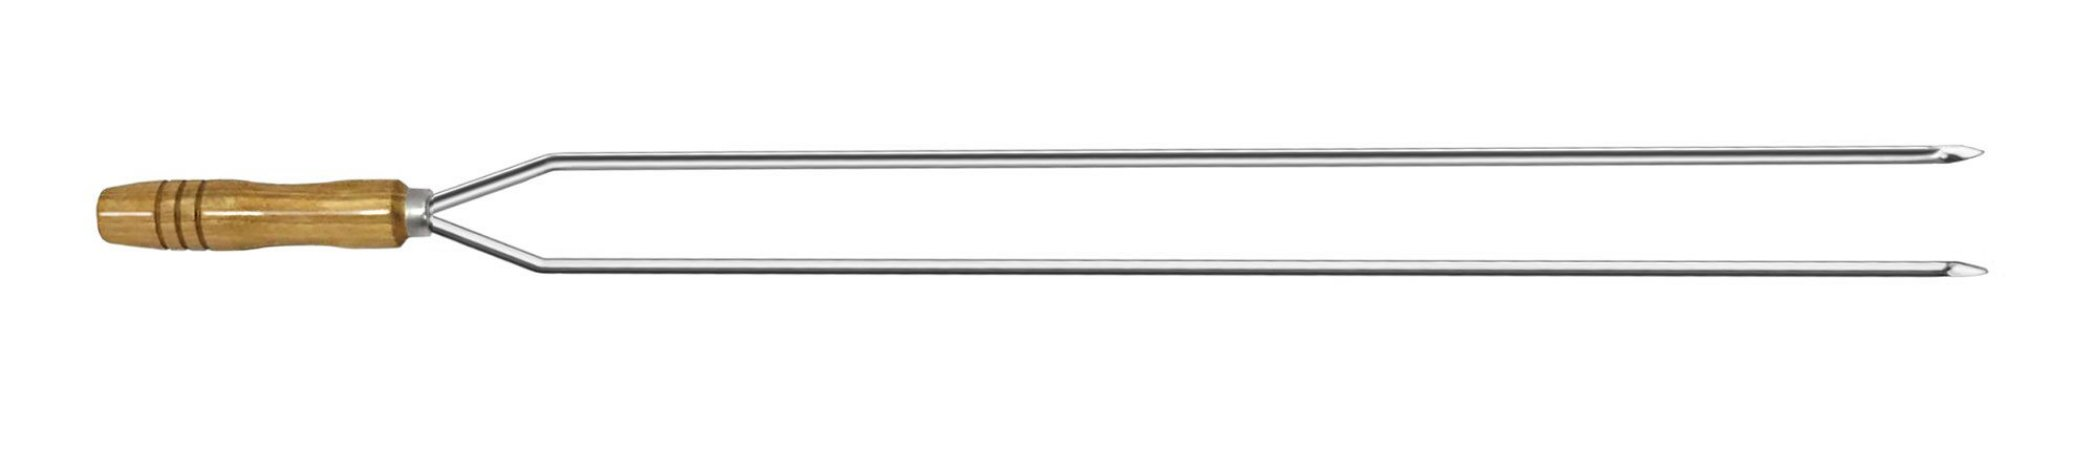 Espeto Inox Cupim Duplo 090 cm x 2 mm